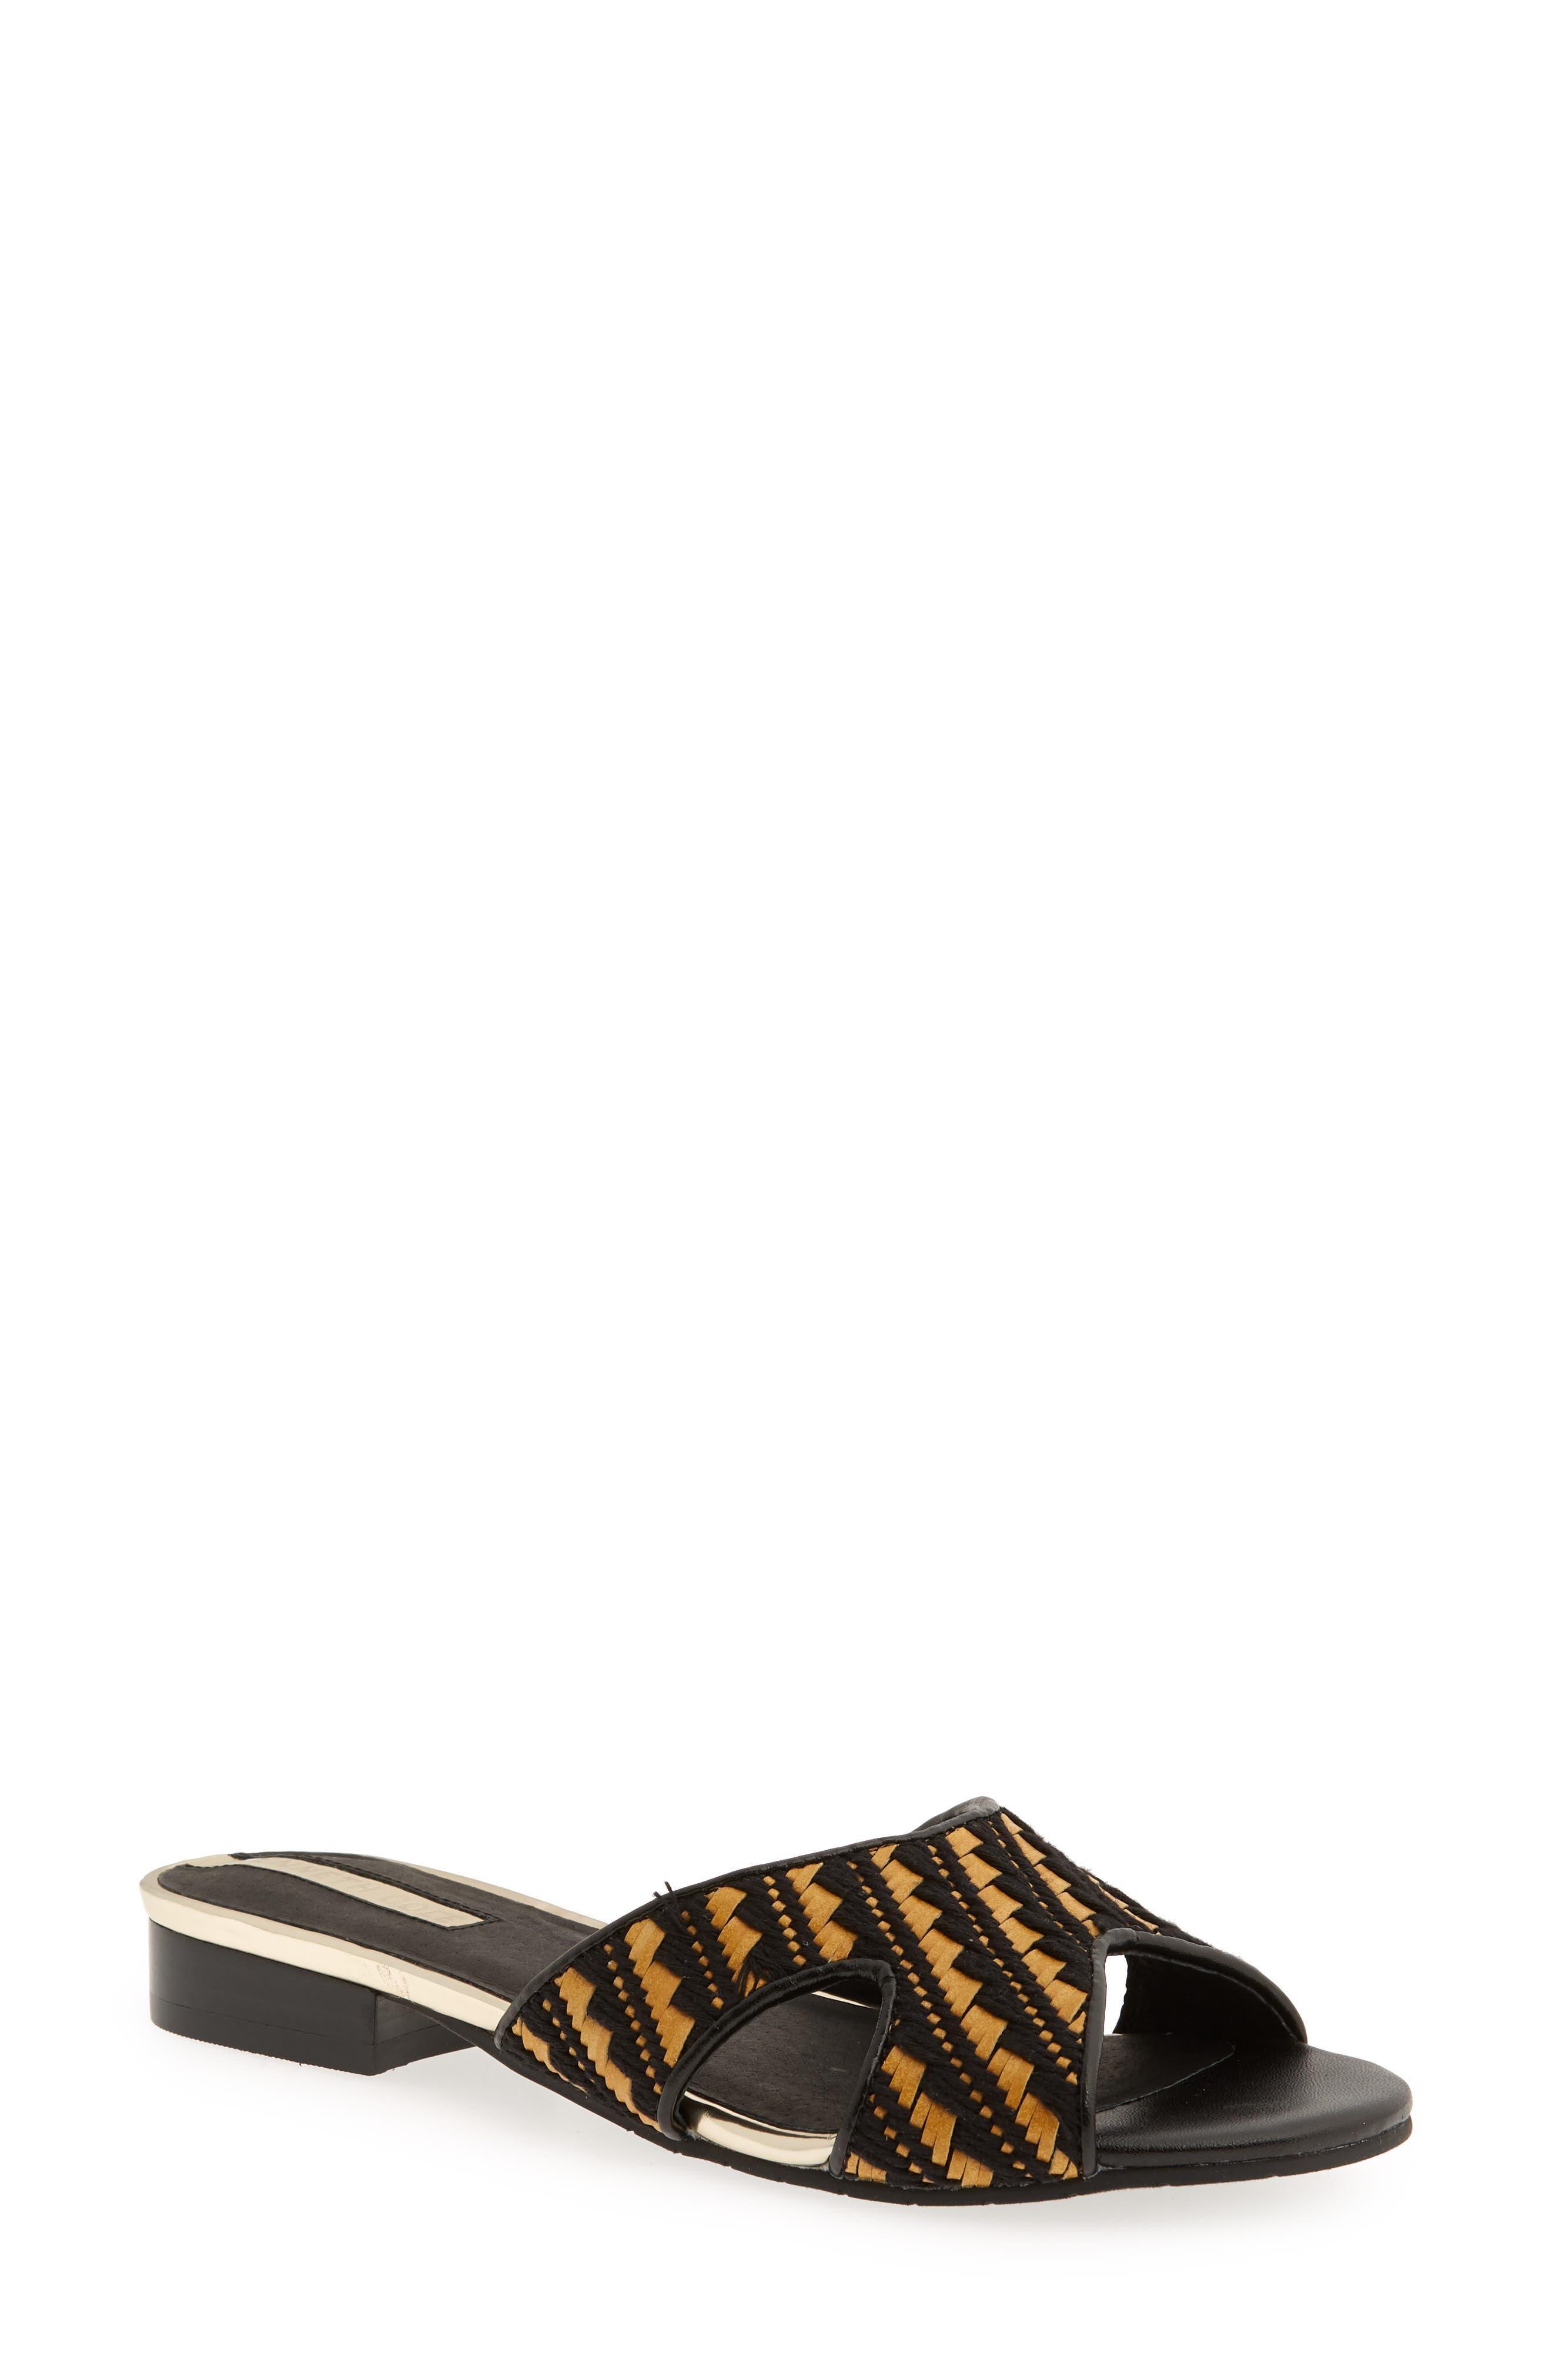 Viveca 2 Slide Sandal,                         Main,                         color, 001